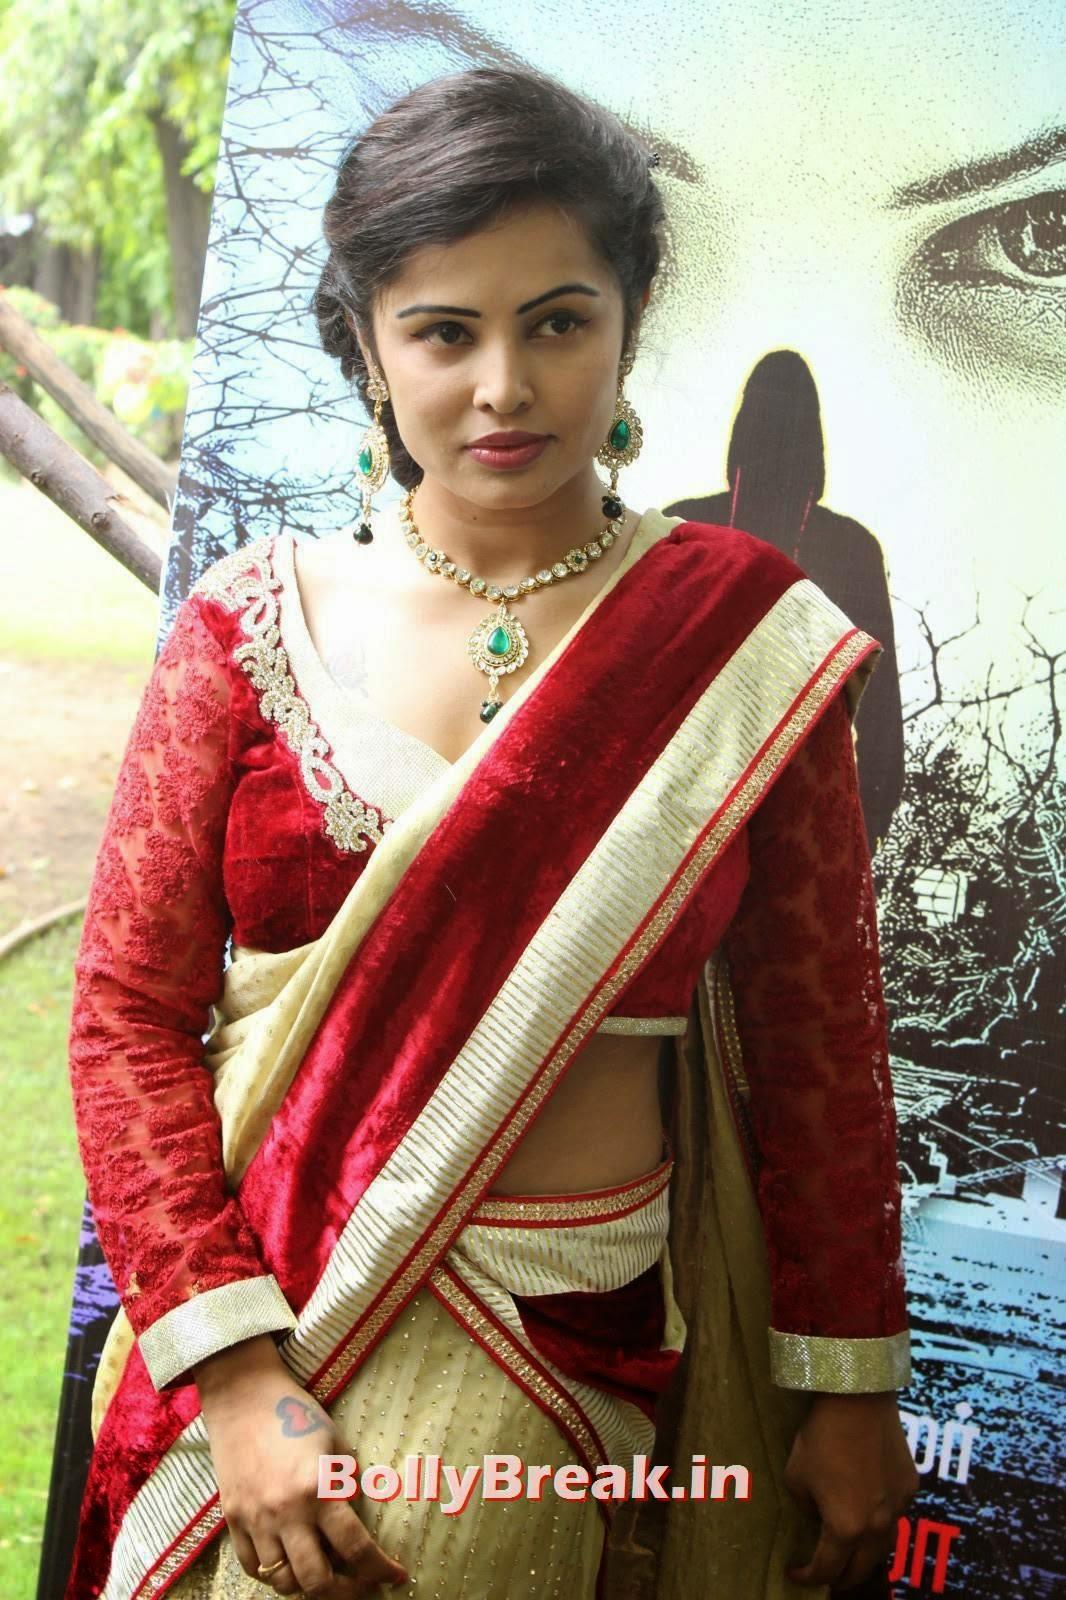 Actress Hashika Dutt Wallpapers, Actress Hashika Dutt hot Pics in low waist saree